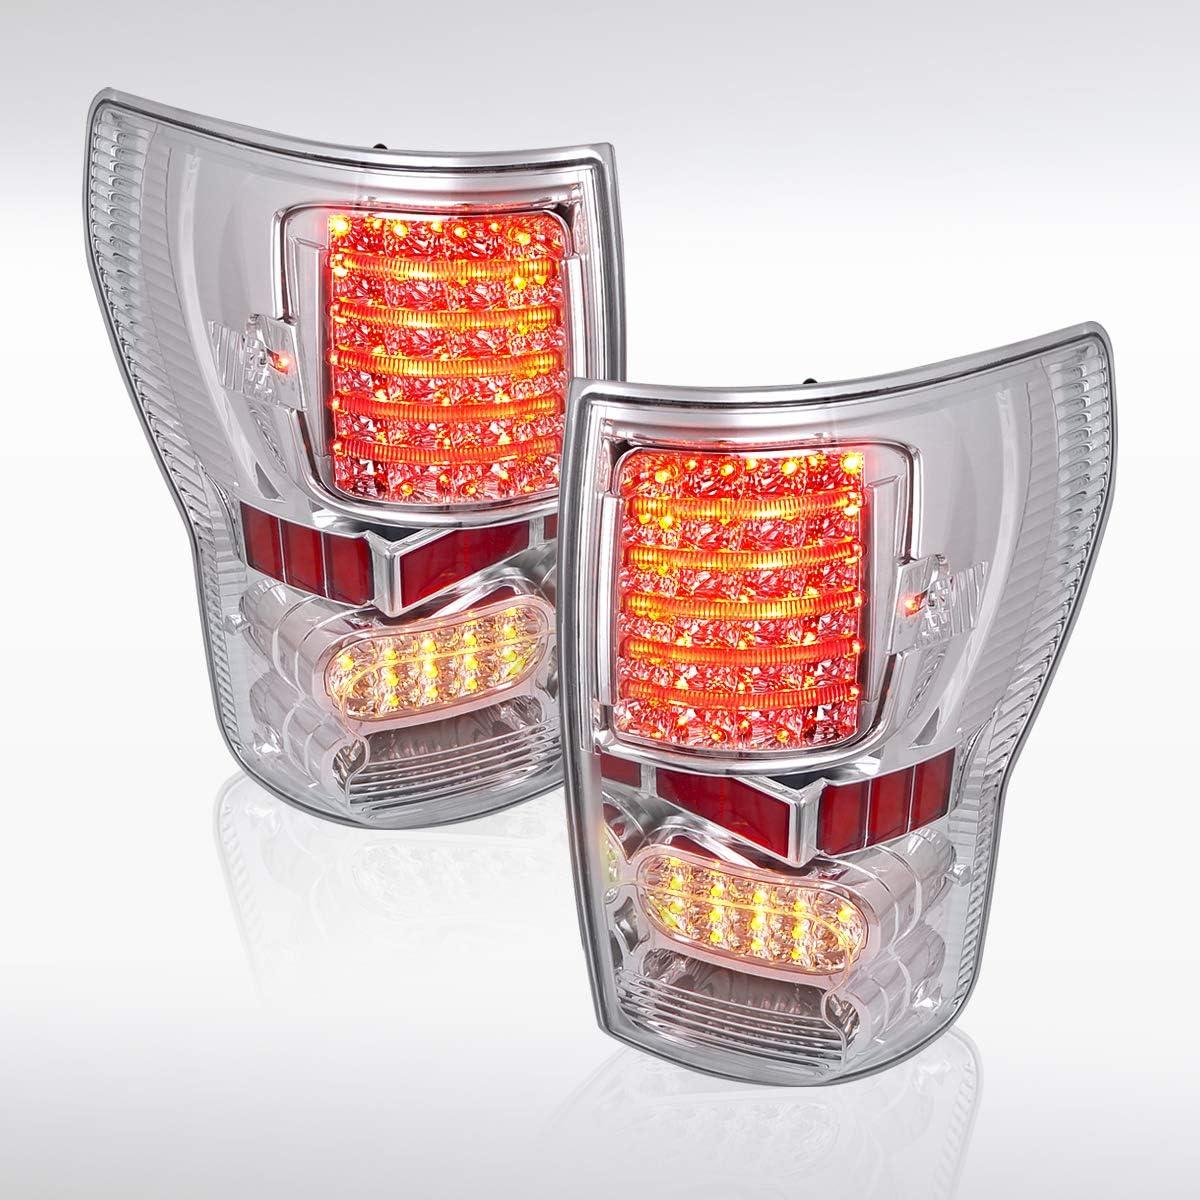 Autozensation 即納送料無料 for 優先配送 2007-2013 Toyota Tundra Rear LED Ta Full Clear